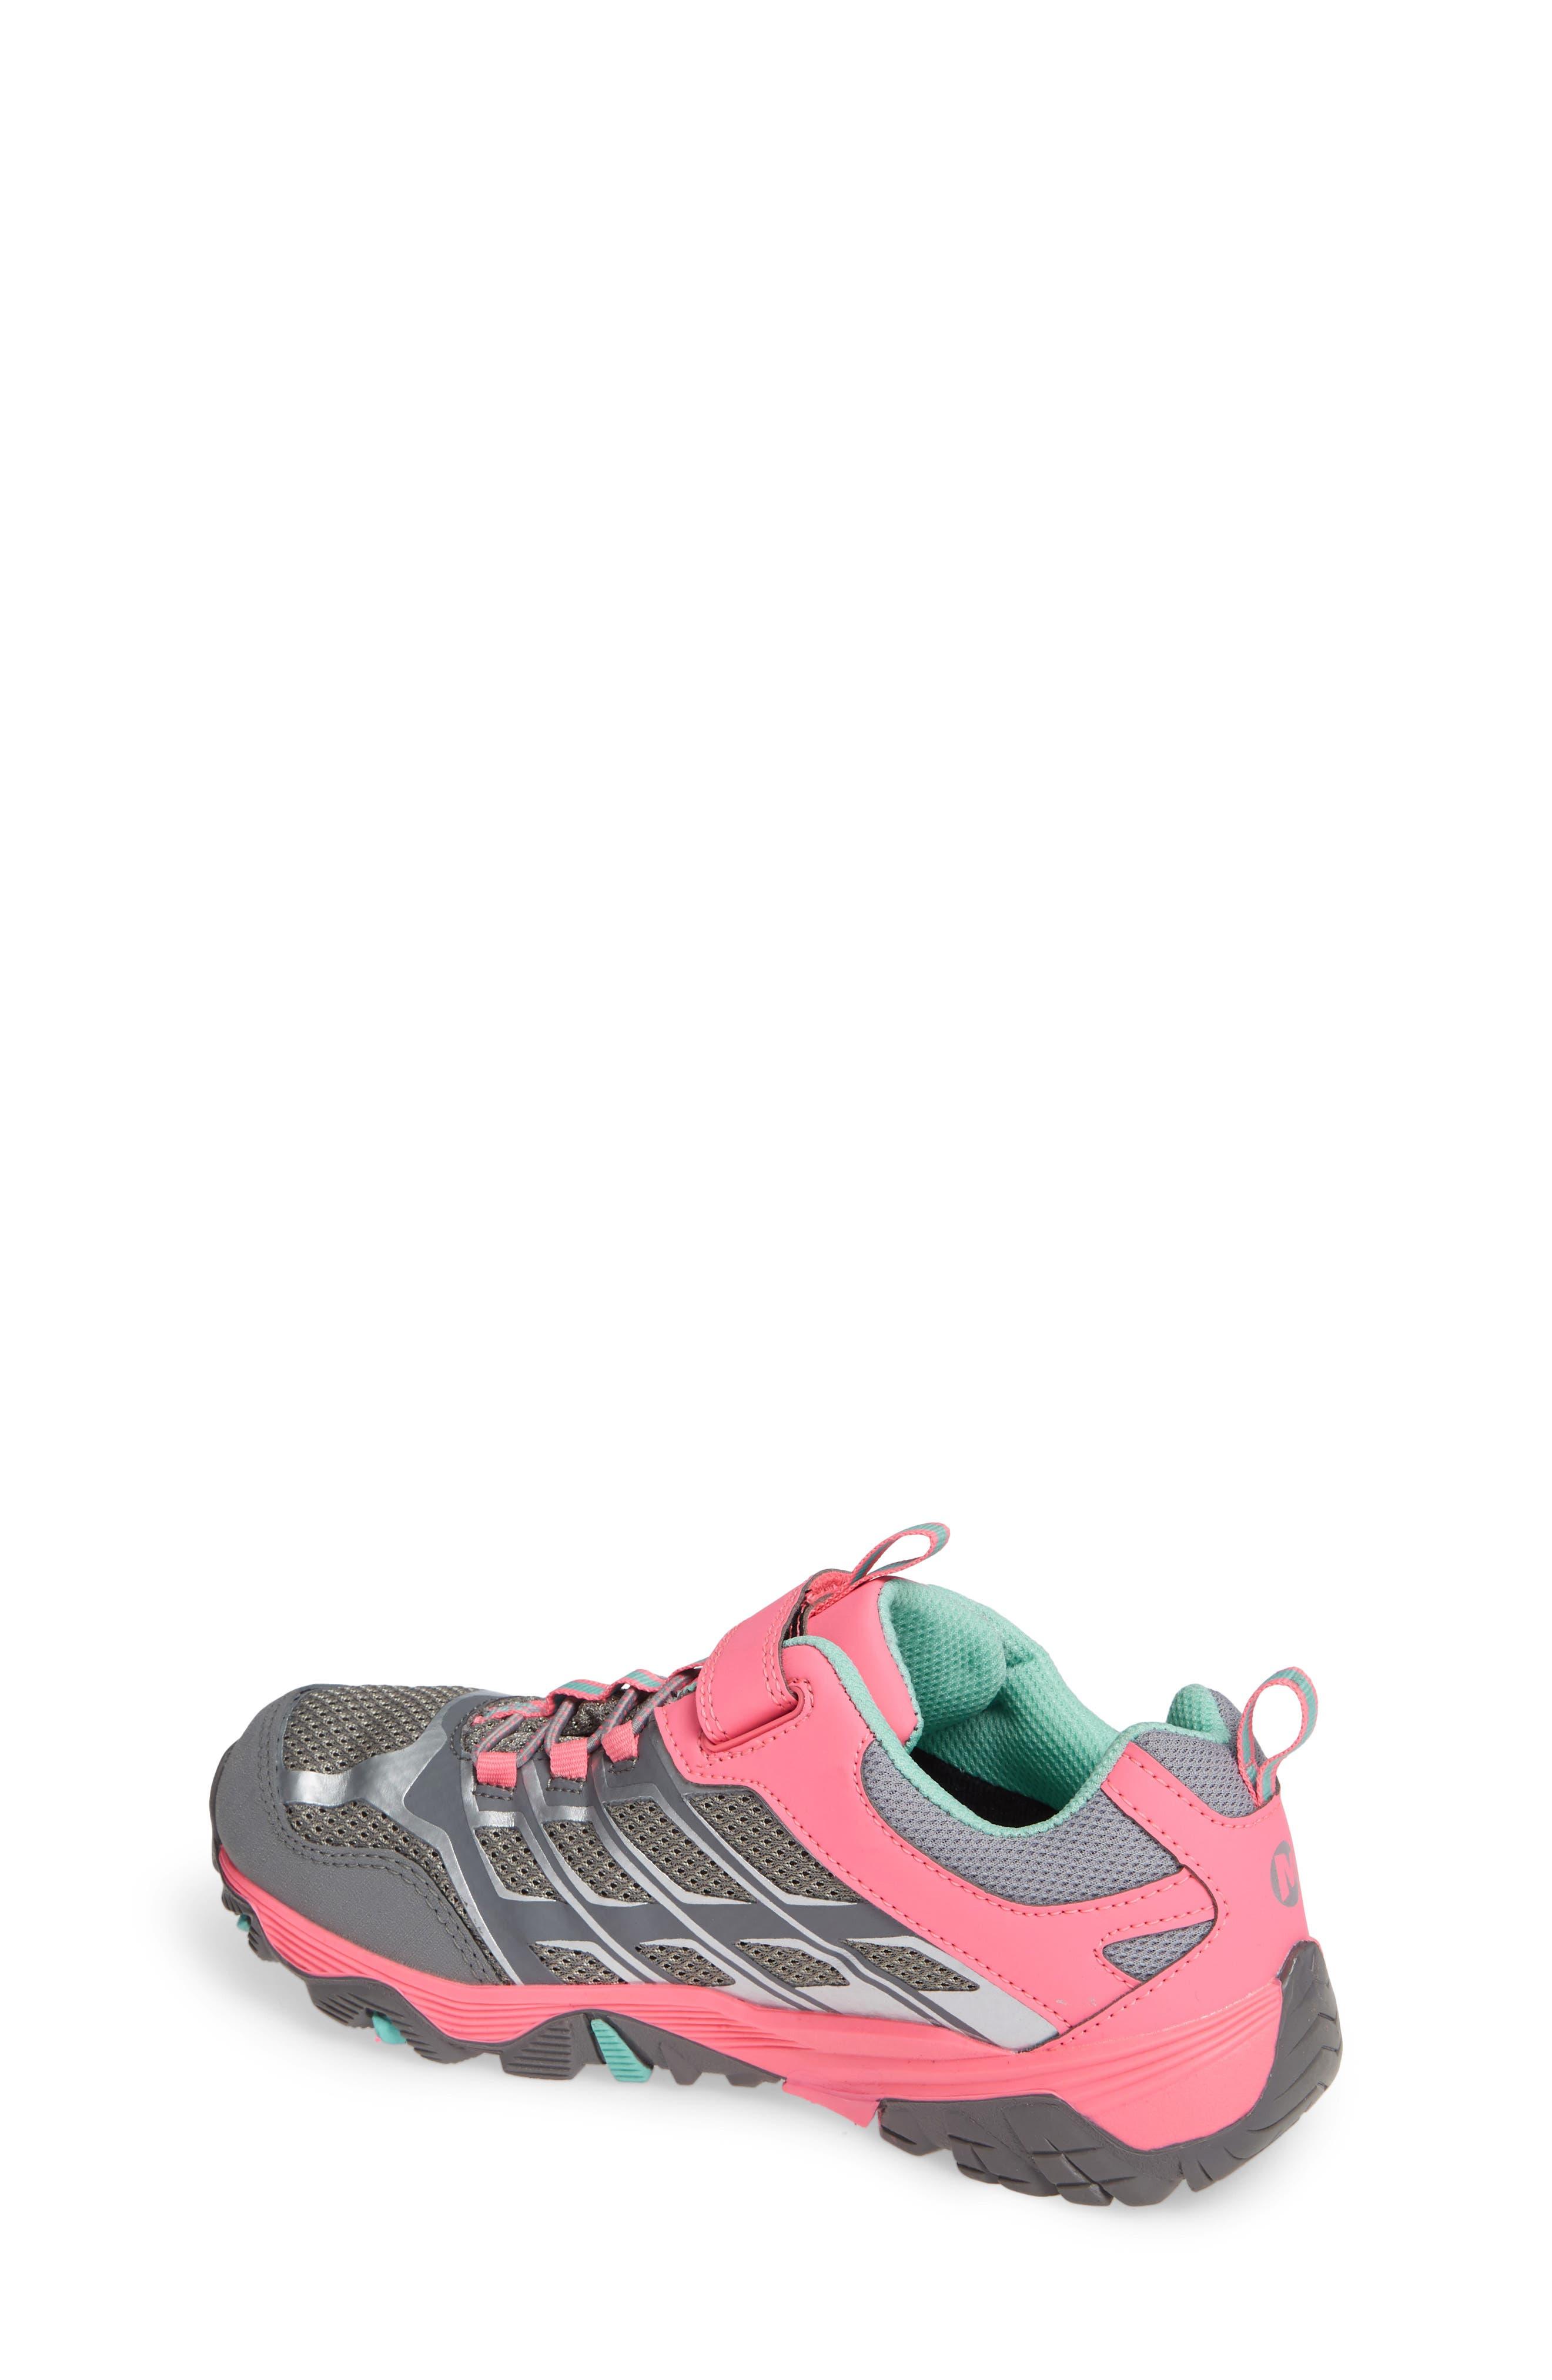 Moab FST Polar Low Waterproof Sneaker,                             Alternate thumbnail 2, color,                             GREY/ CORAL